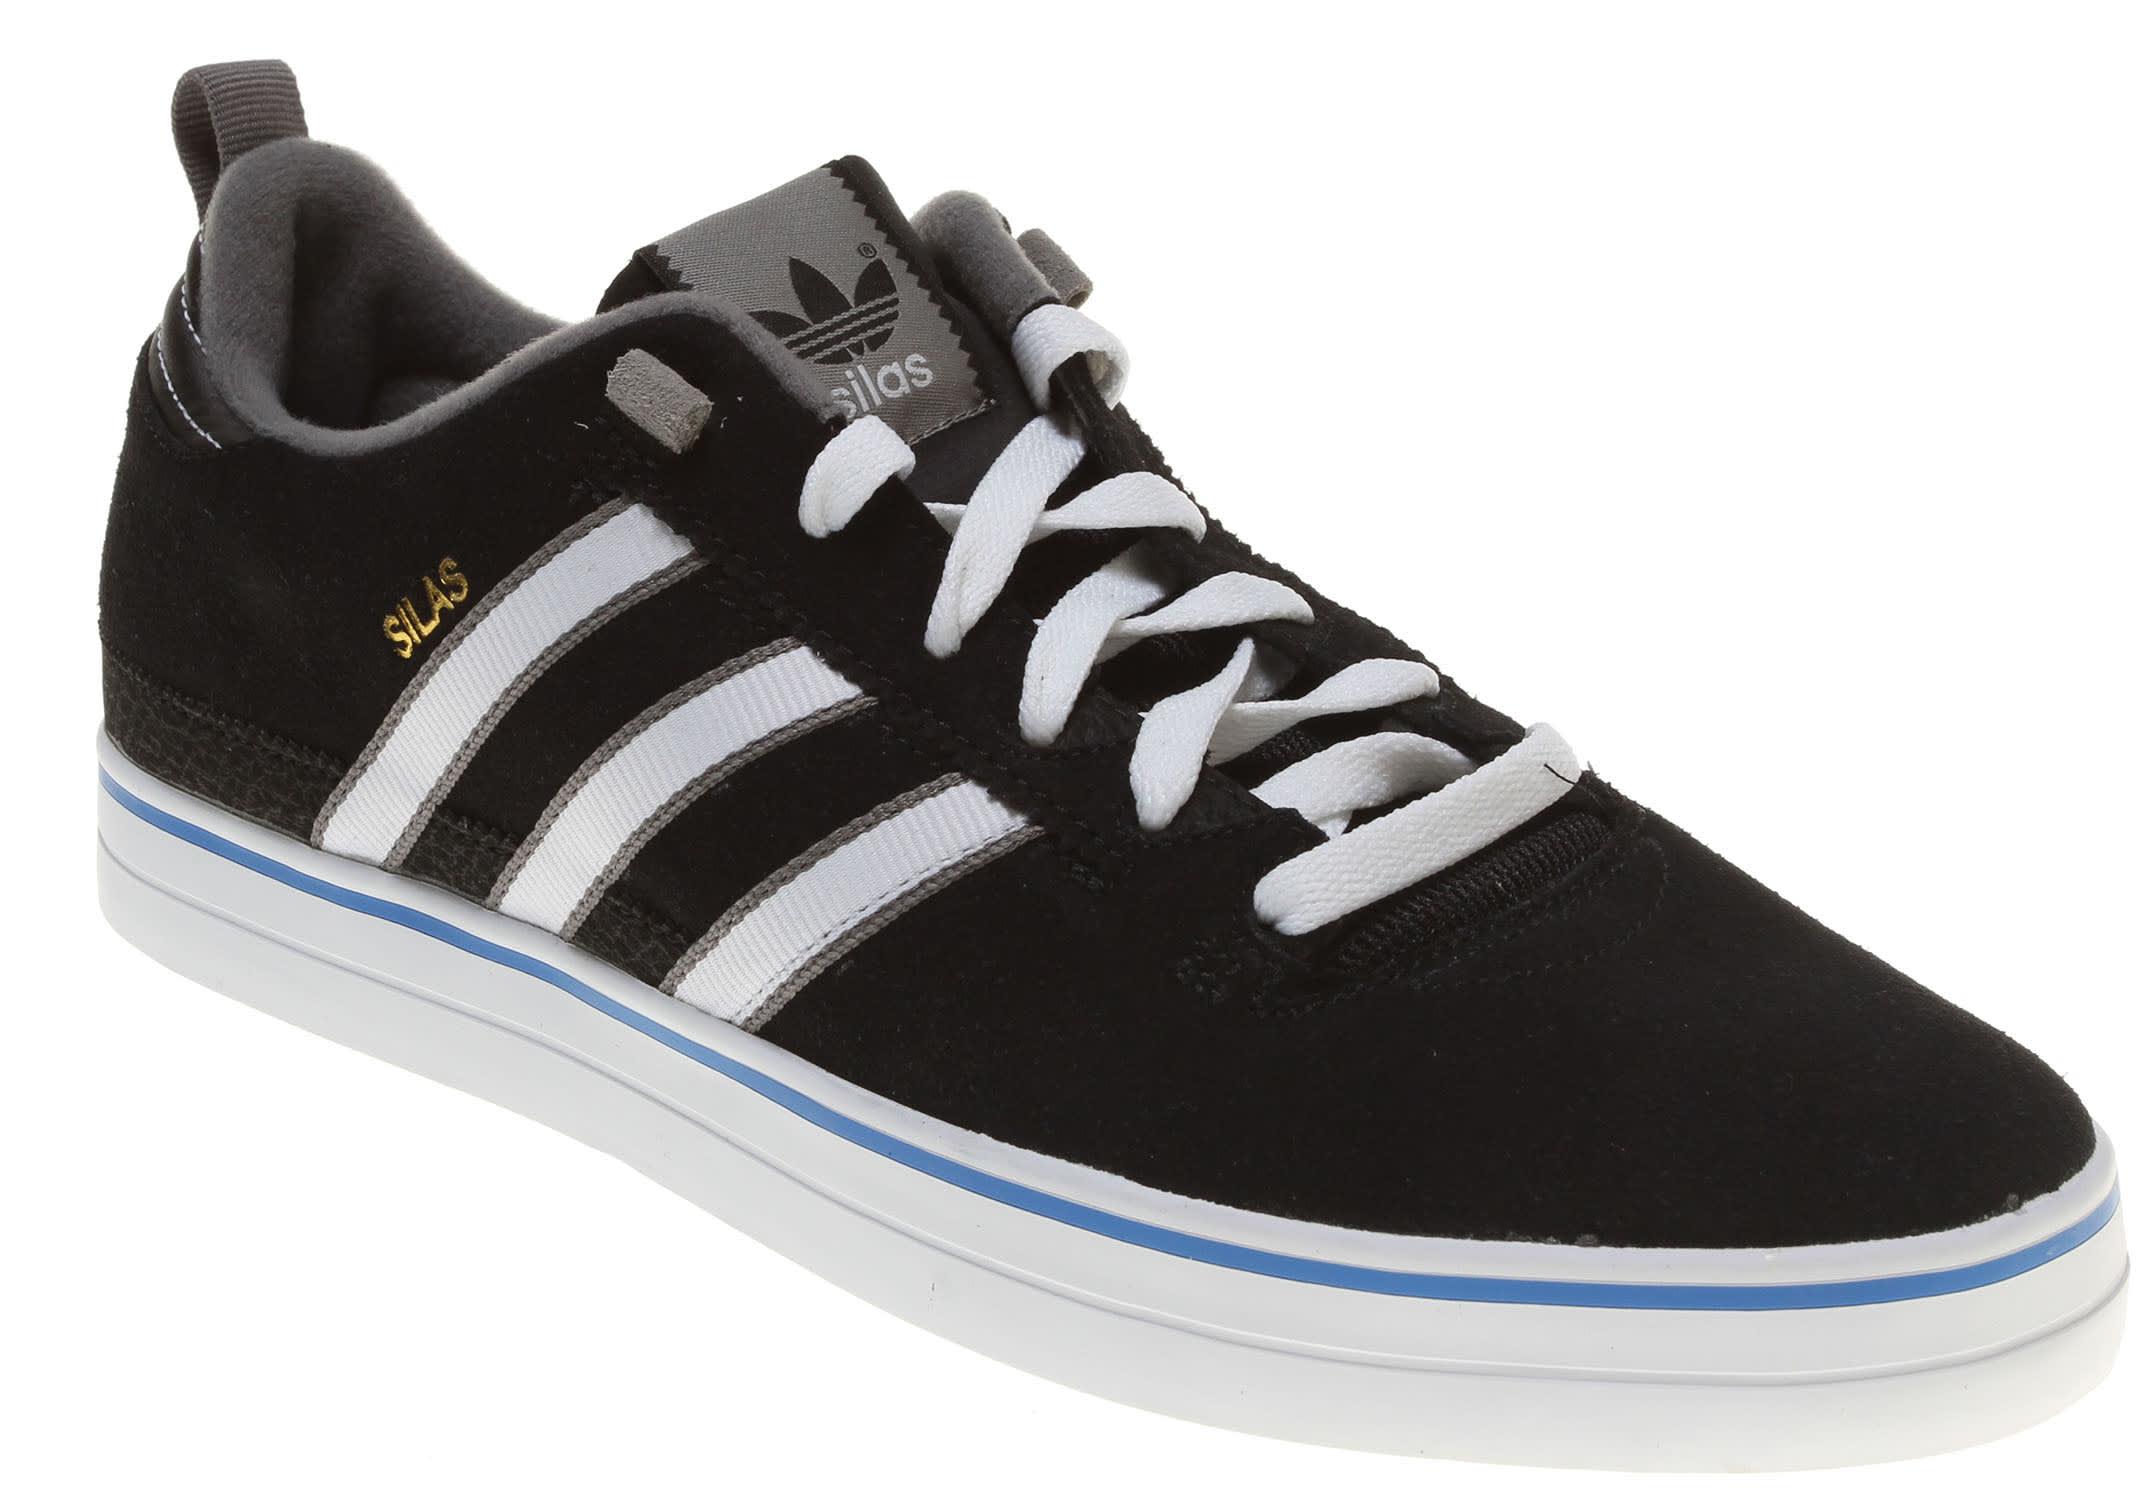 dab787afbbac ... where can i buy adidas silas pro ii skate shoes thumbnail 2 e4e1f 79254